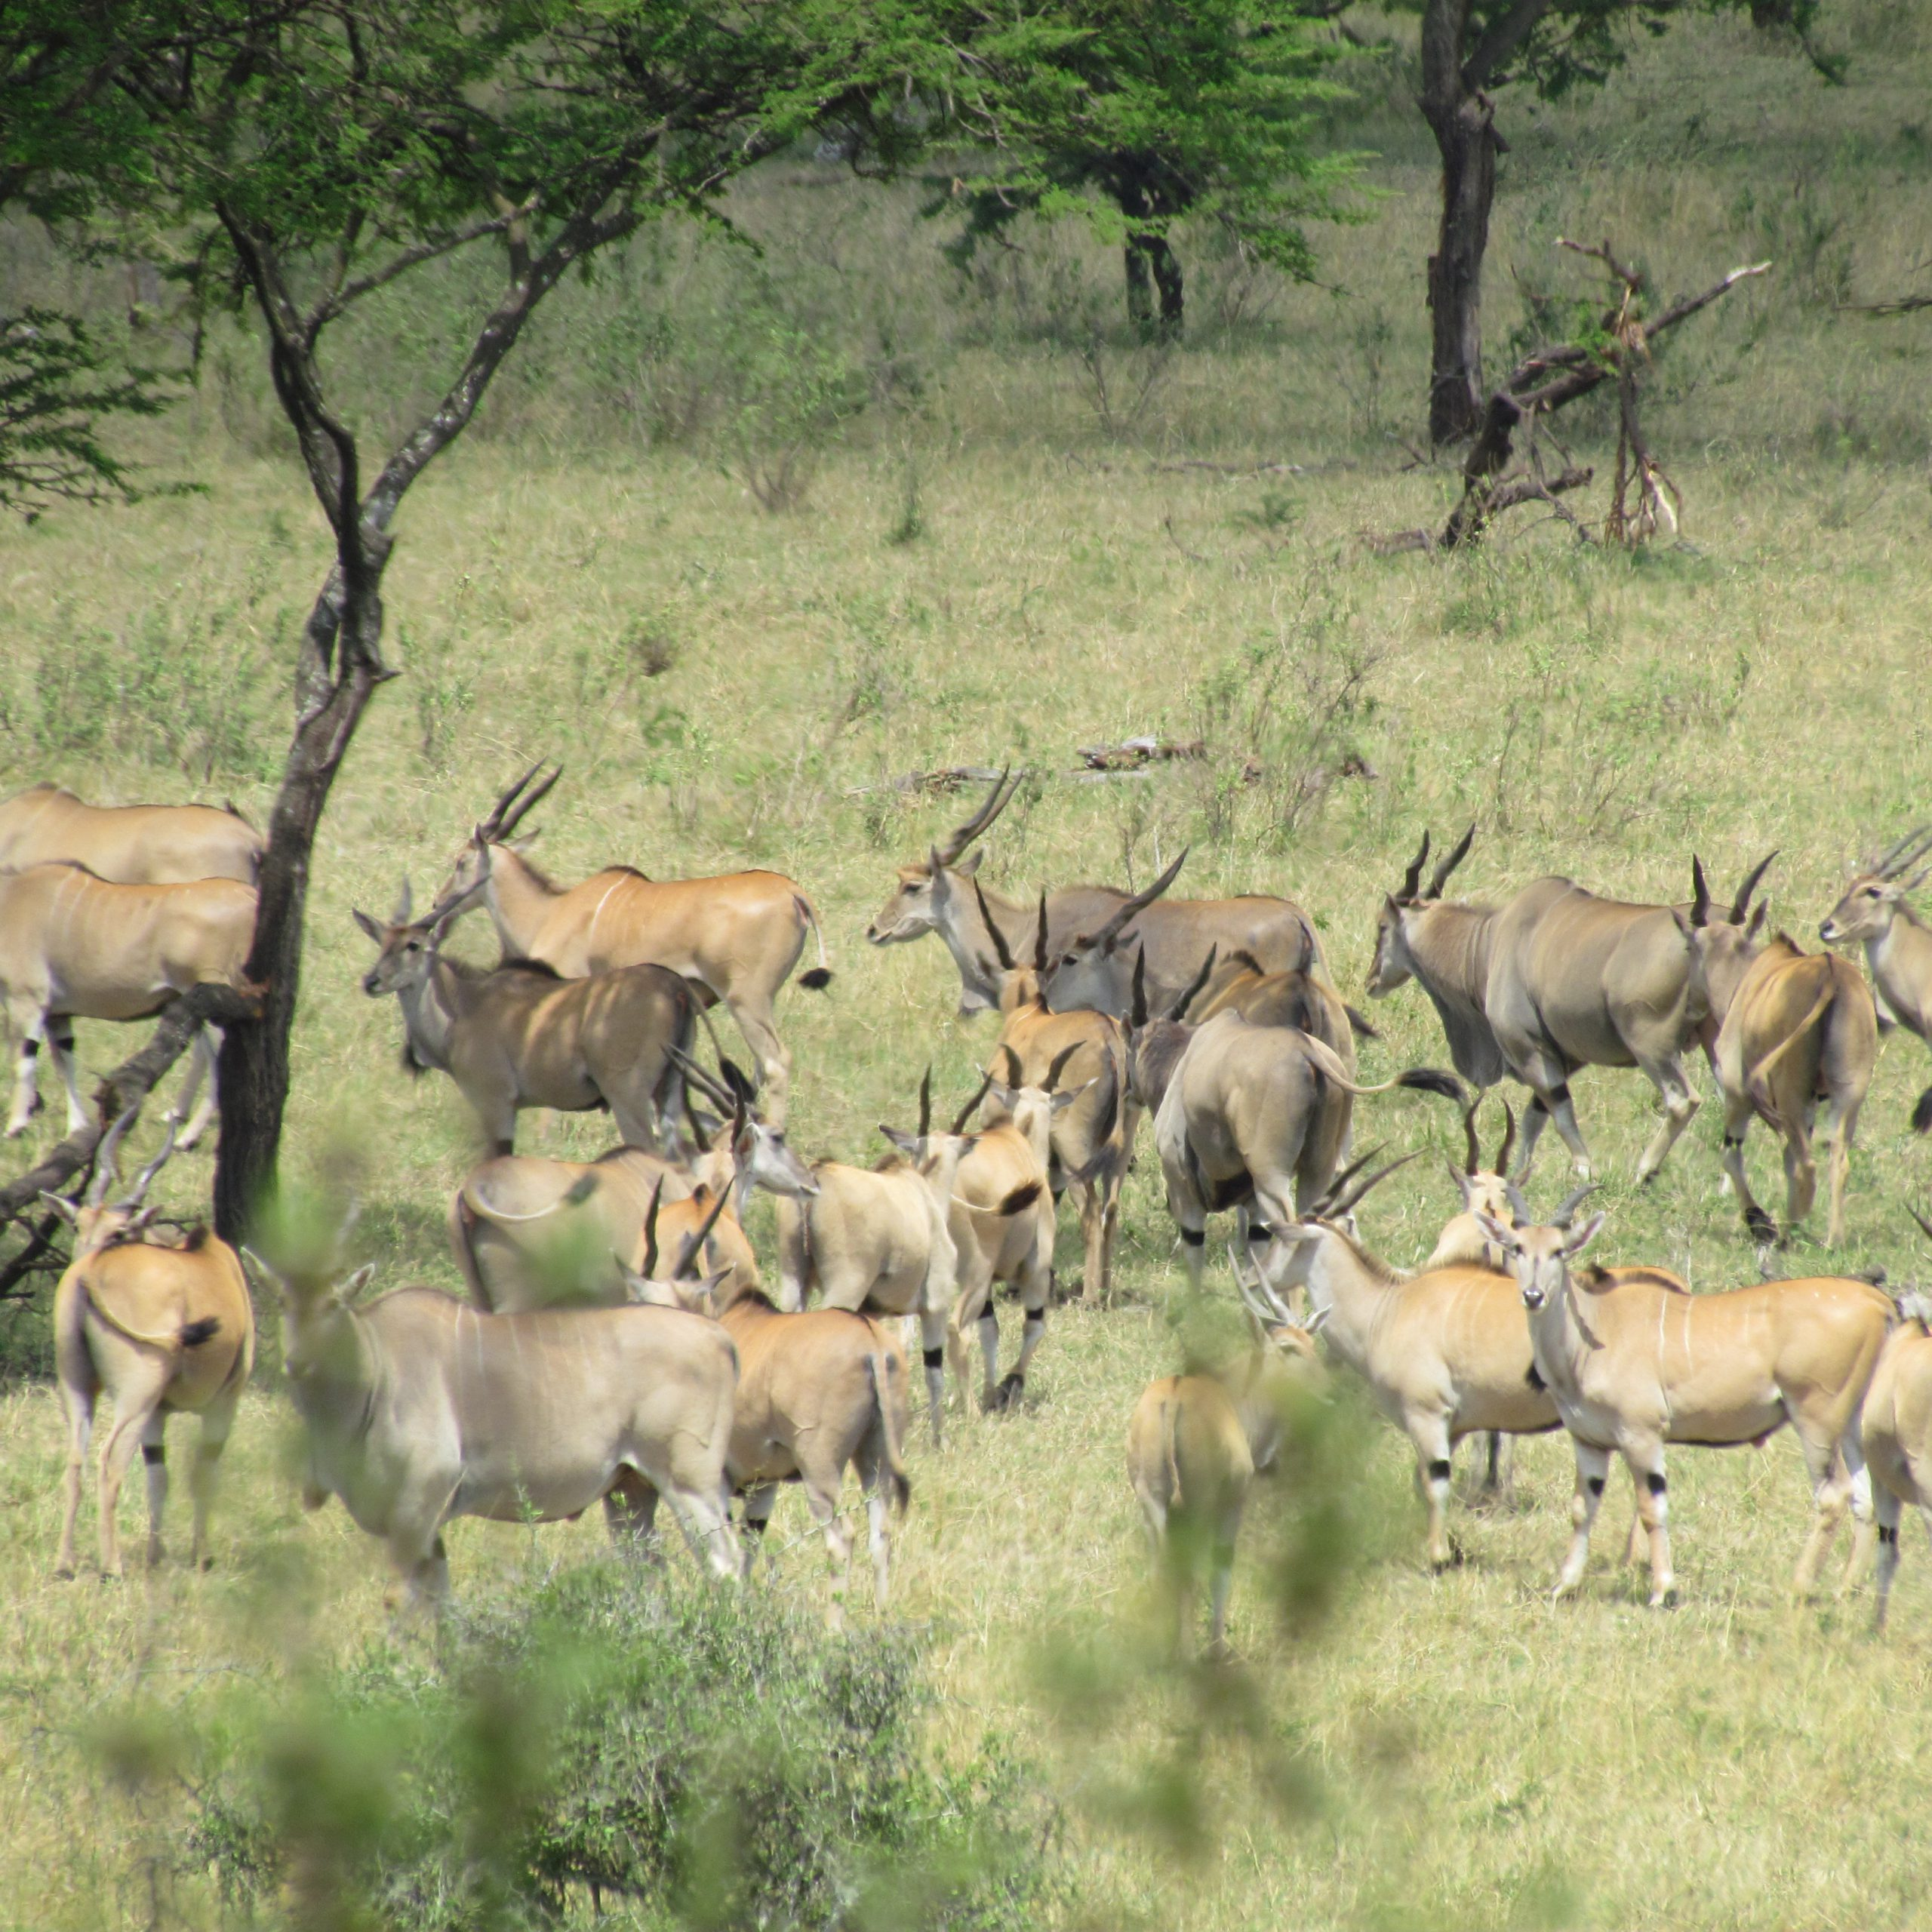 Day 3: Tarangire National Park to Serengeti National Park